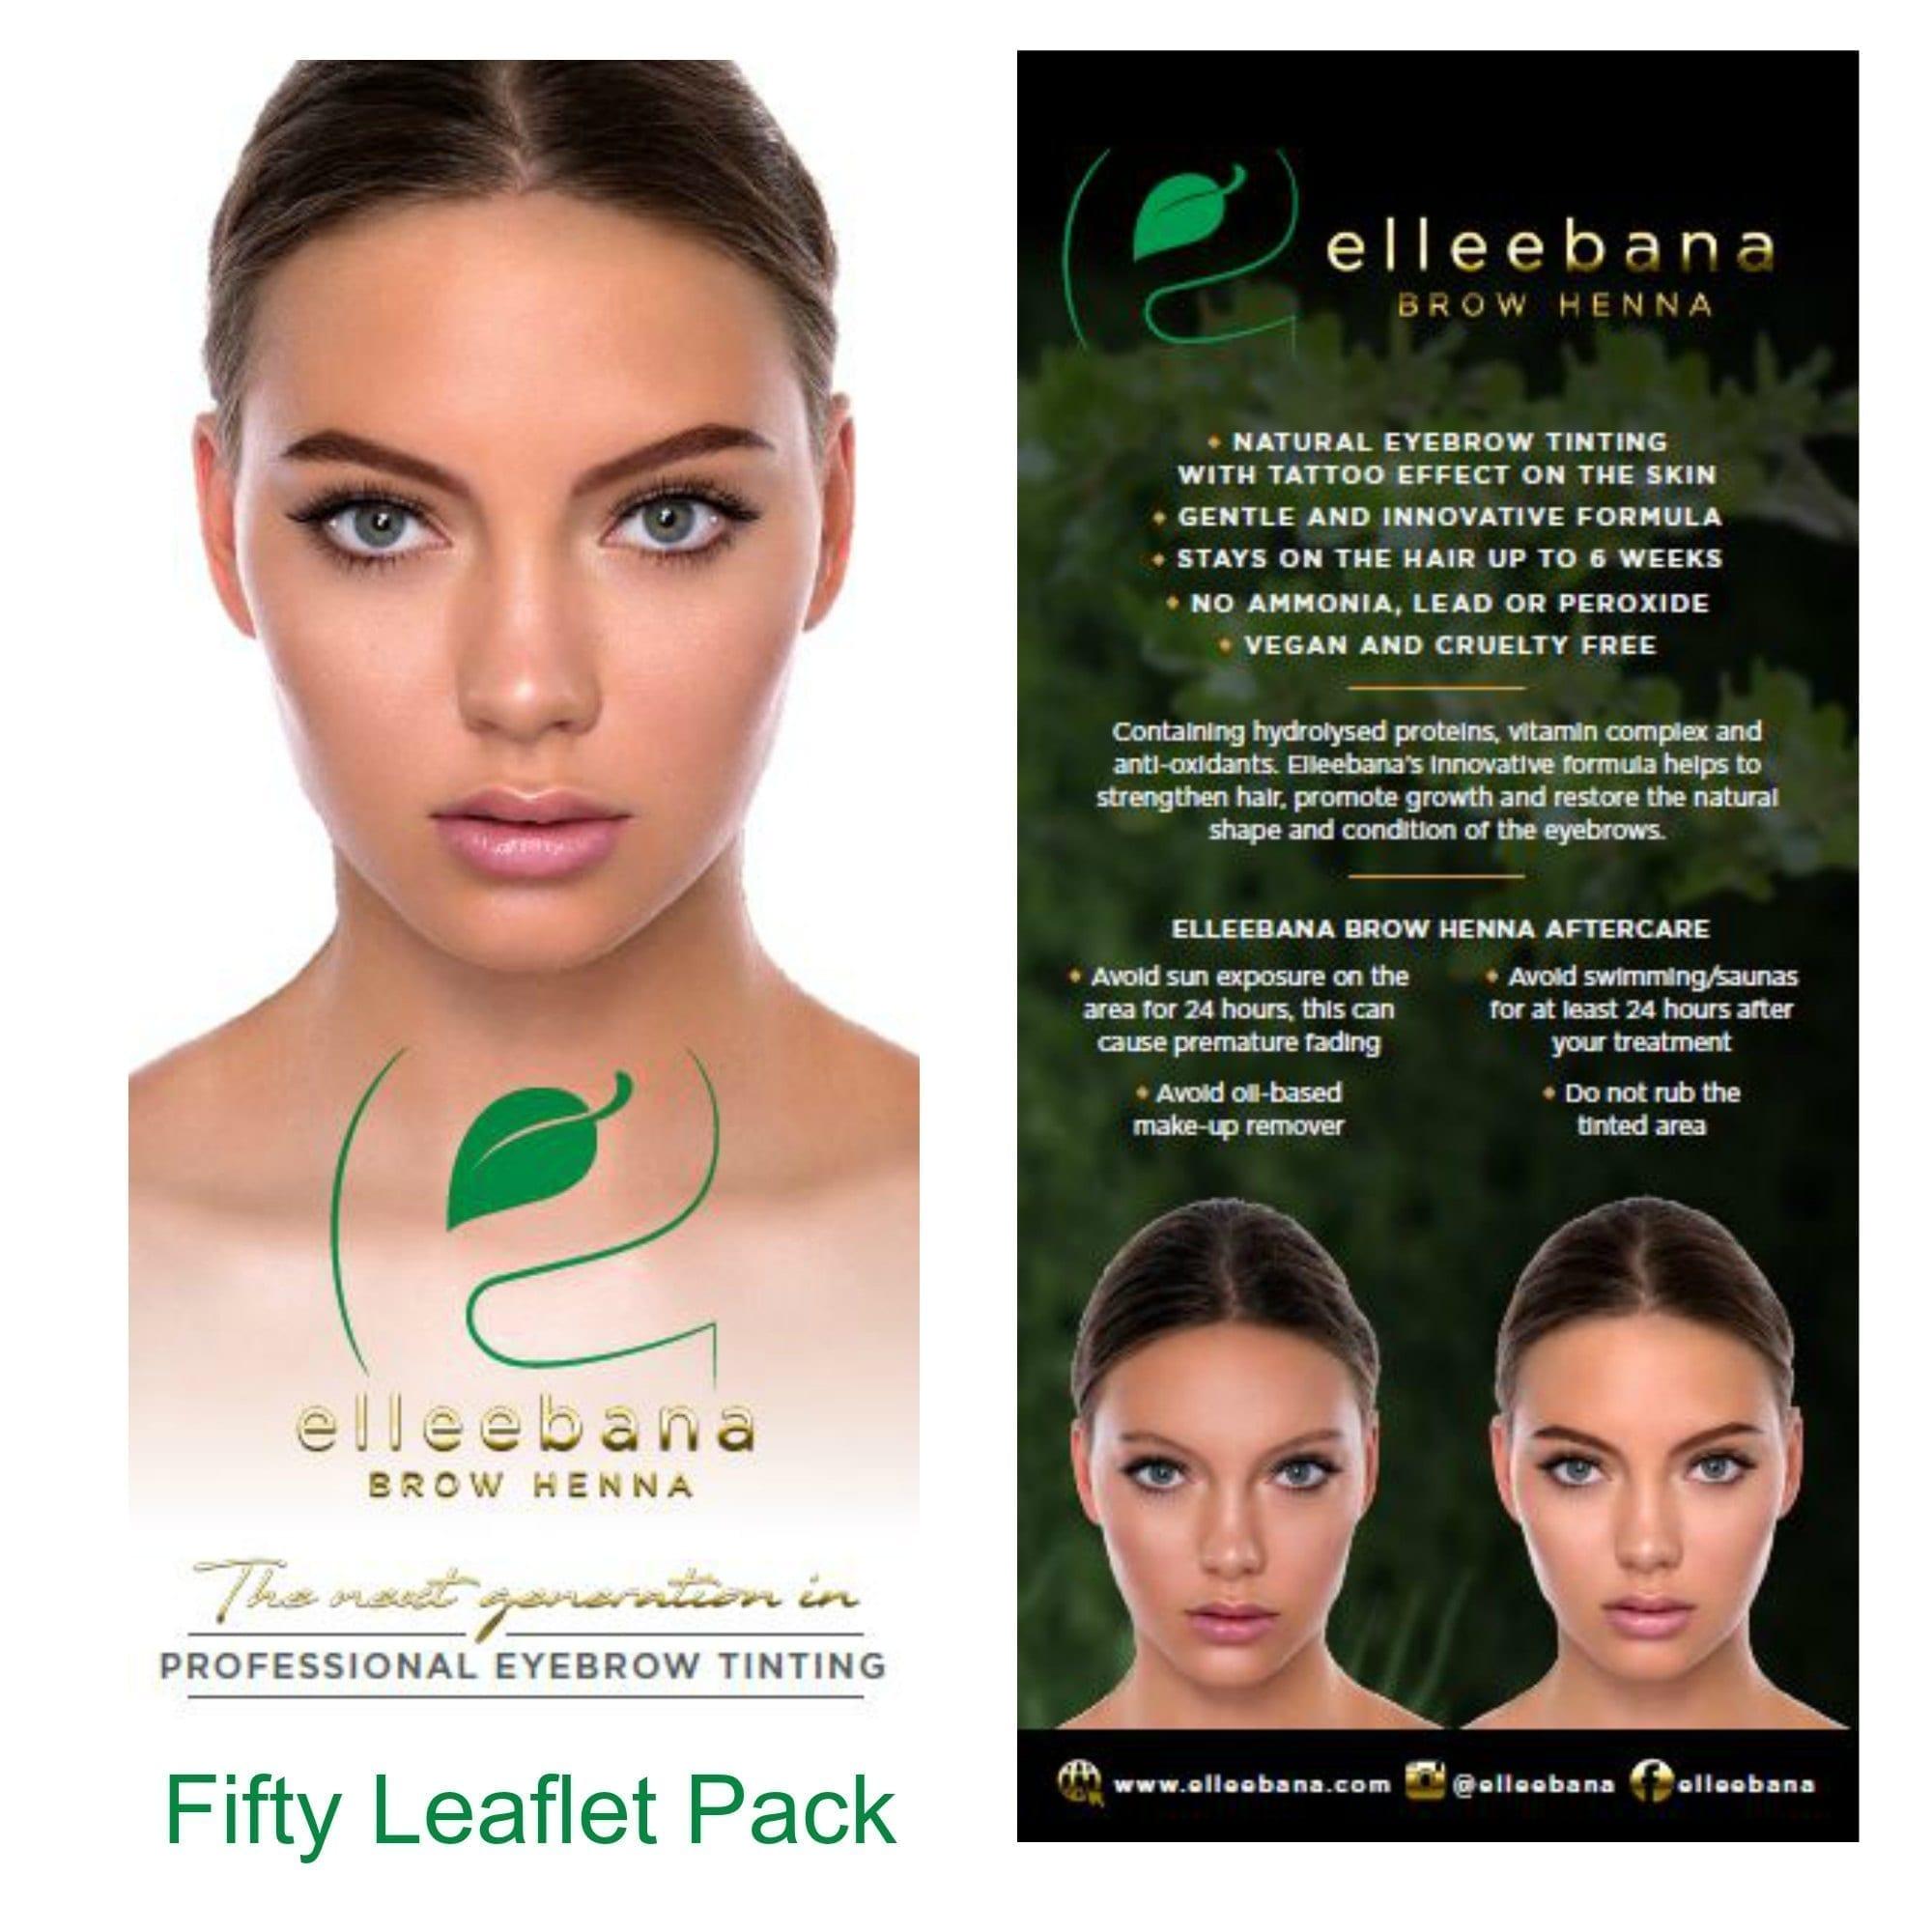 Elleebana Brow Henna Client Information Leaflets Packs Of 50